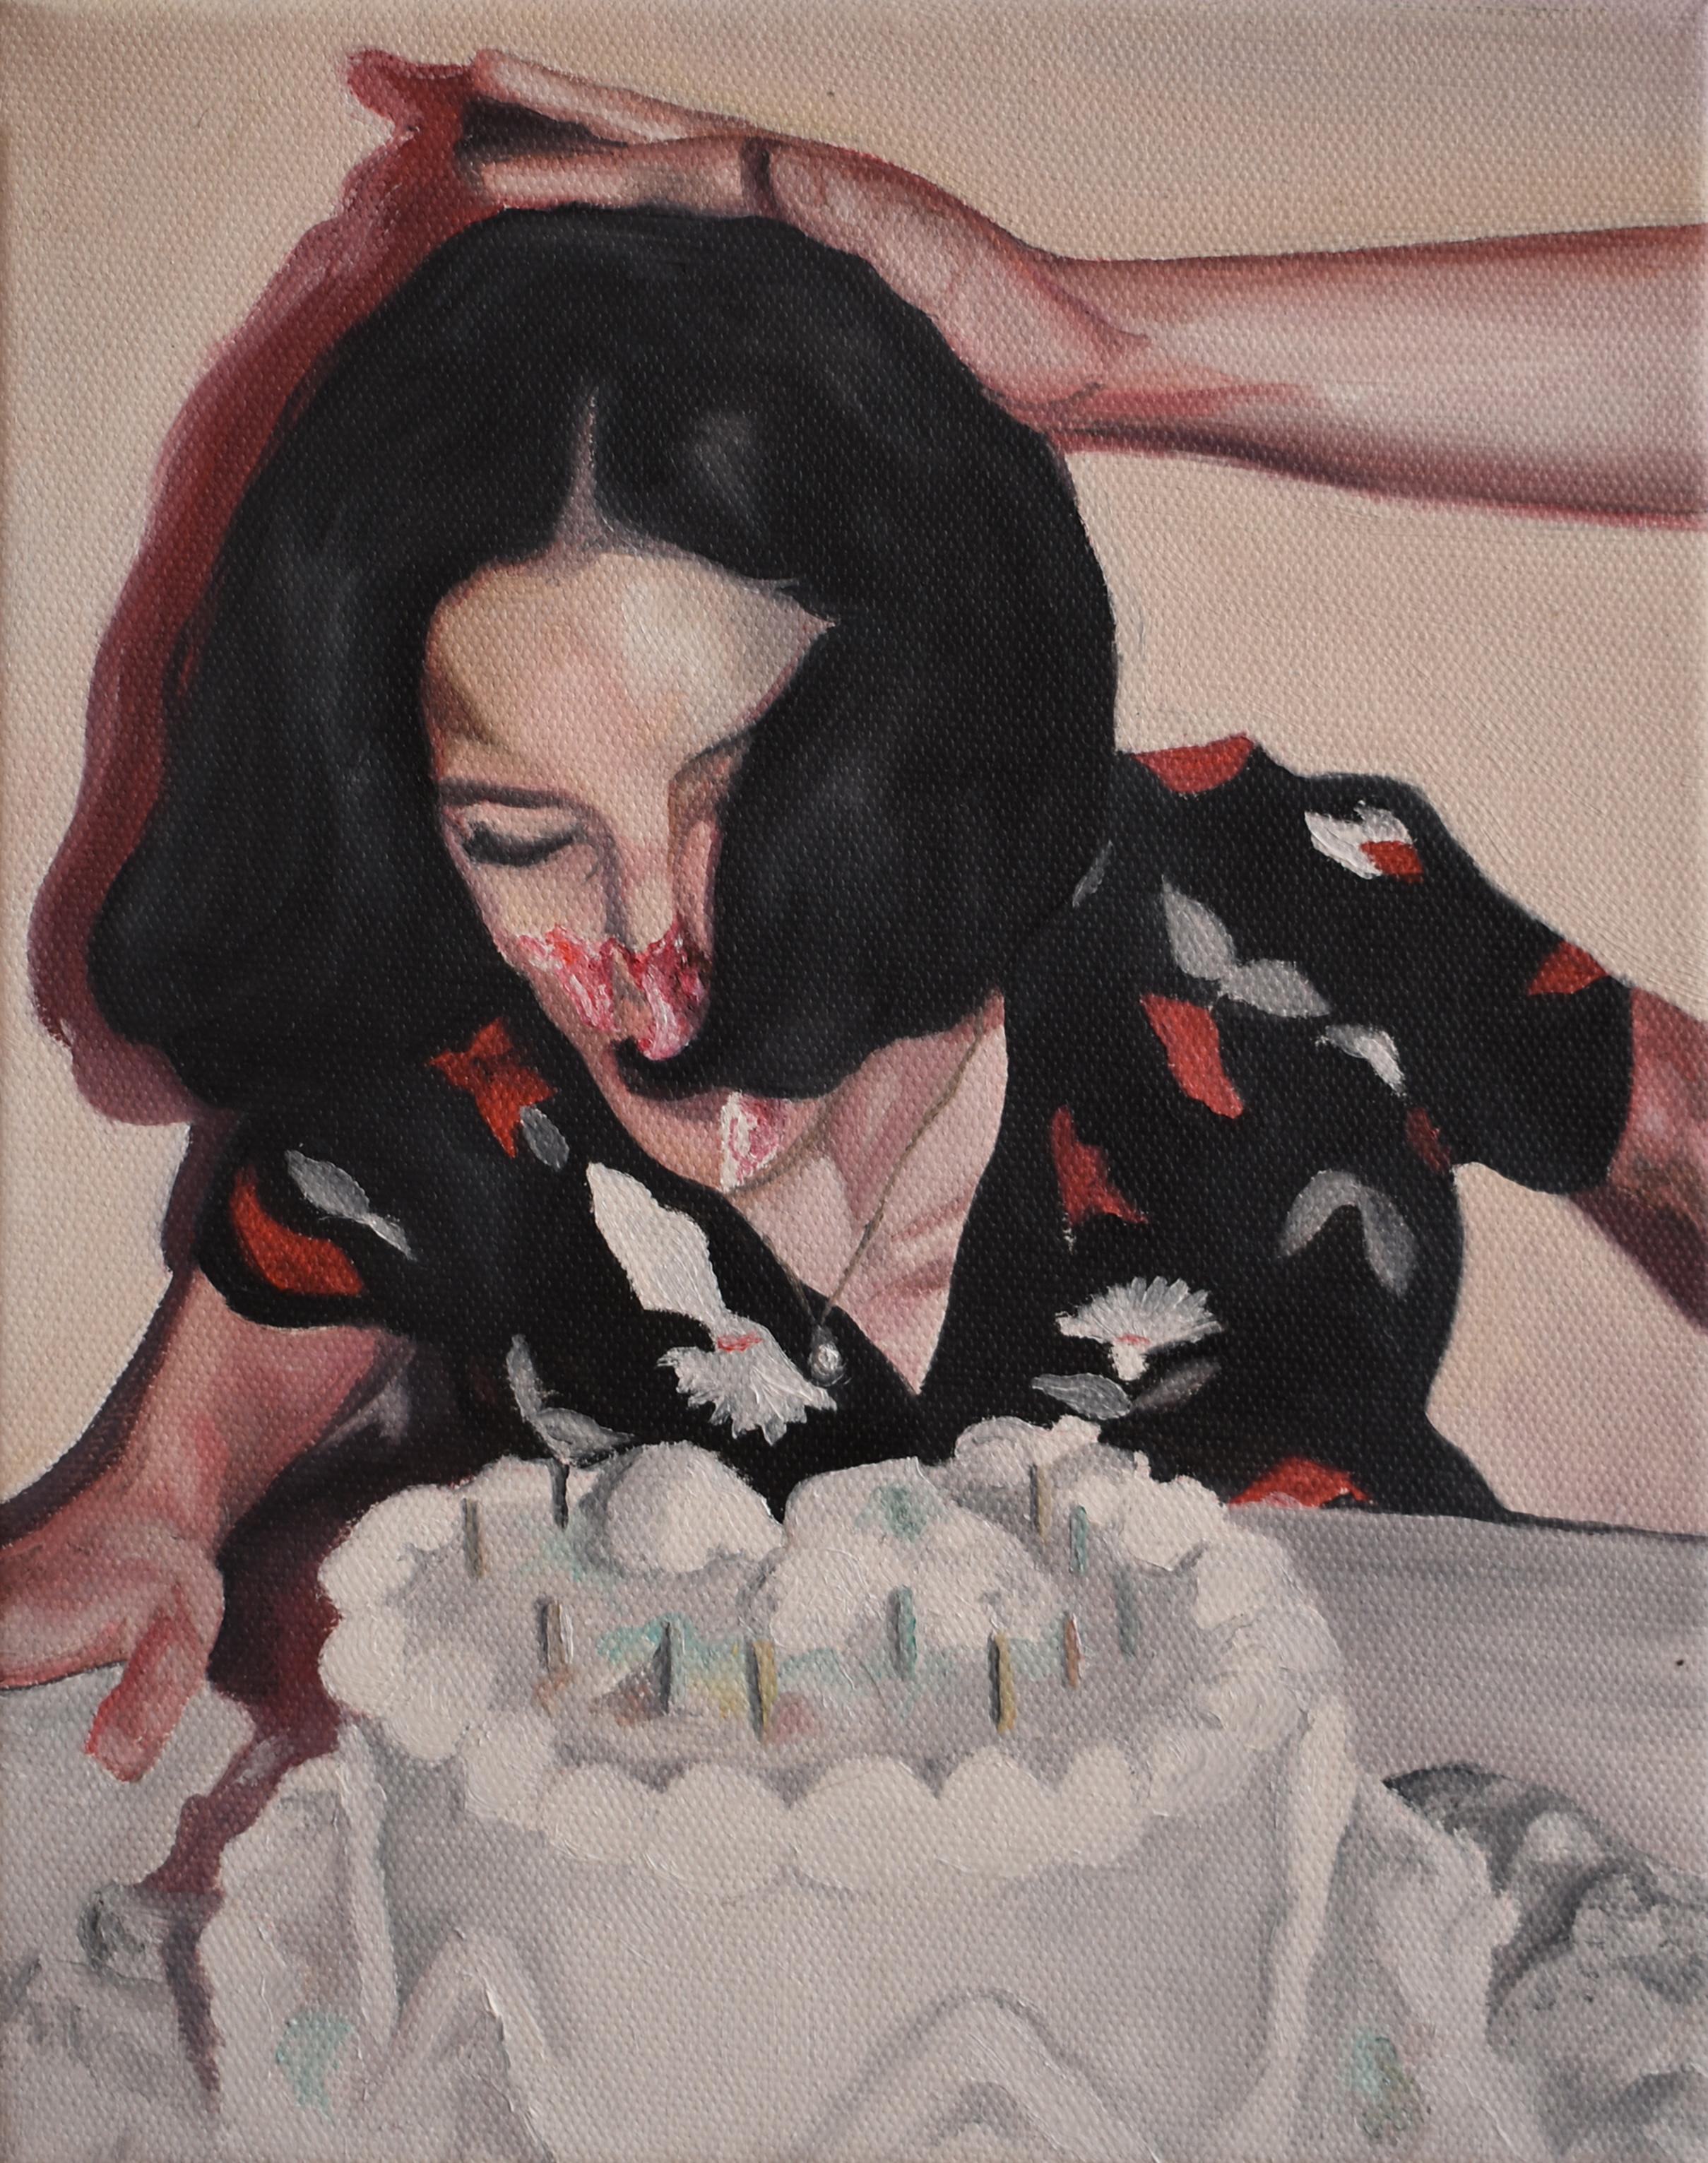 Diecisiete años   Oleo sobre canvas, 20x25cm 2017